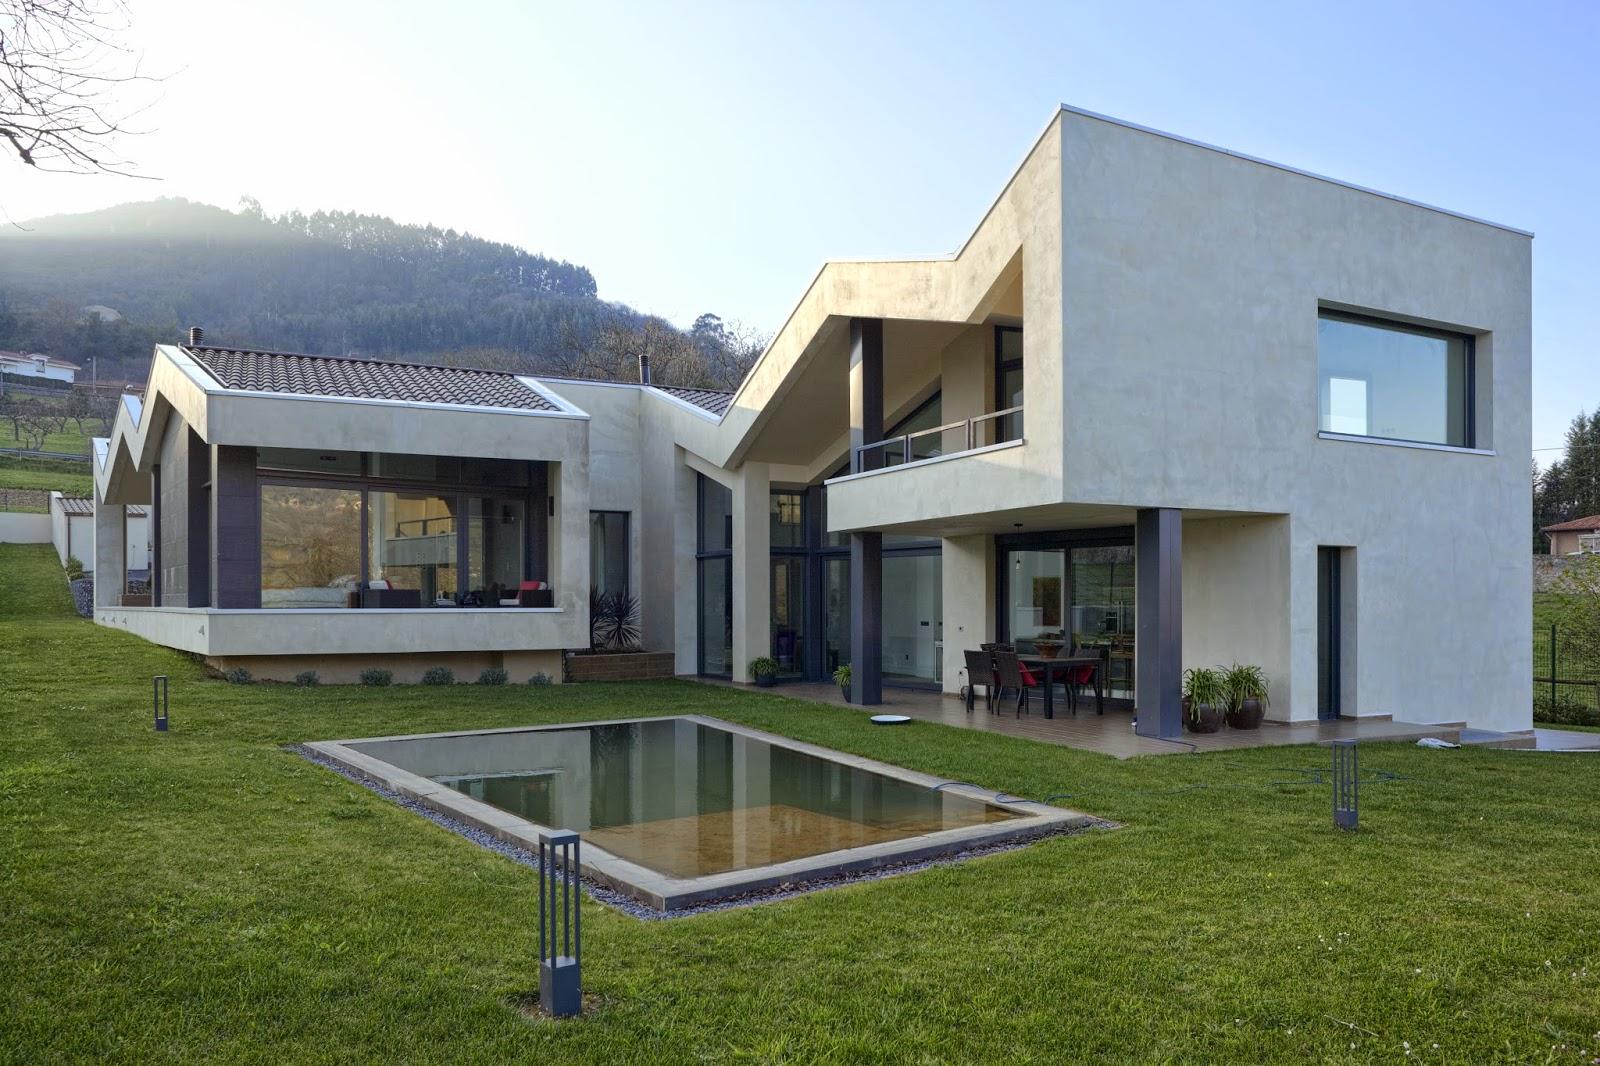 Casa vp pablo fern ndez fern ndez aib architecture obras - Arquitectos en gijon ...